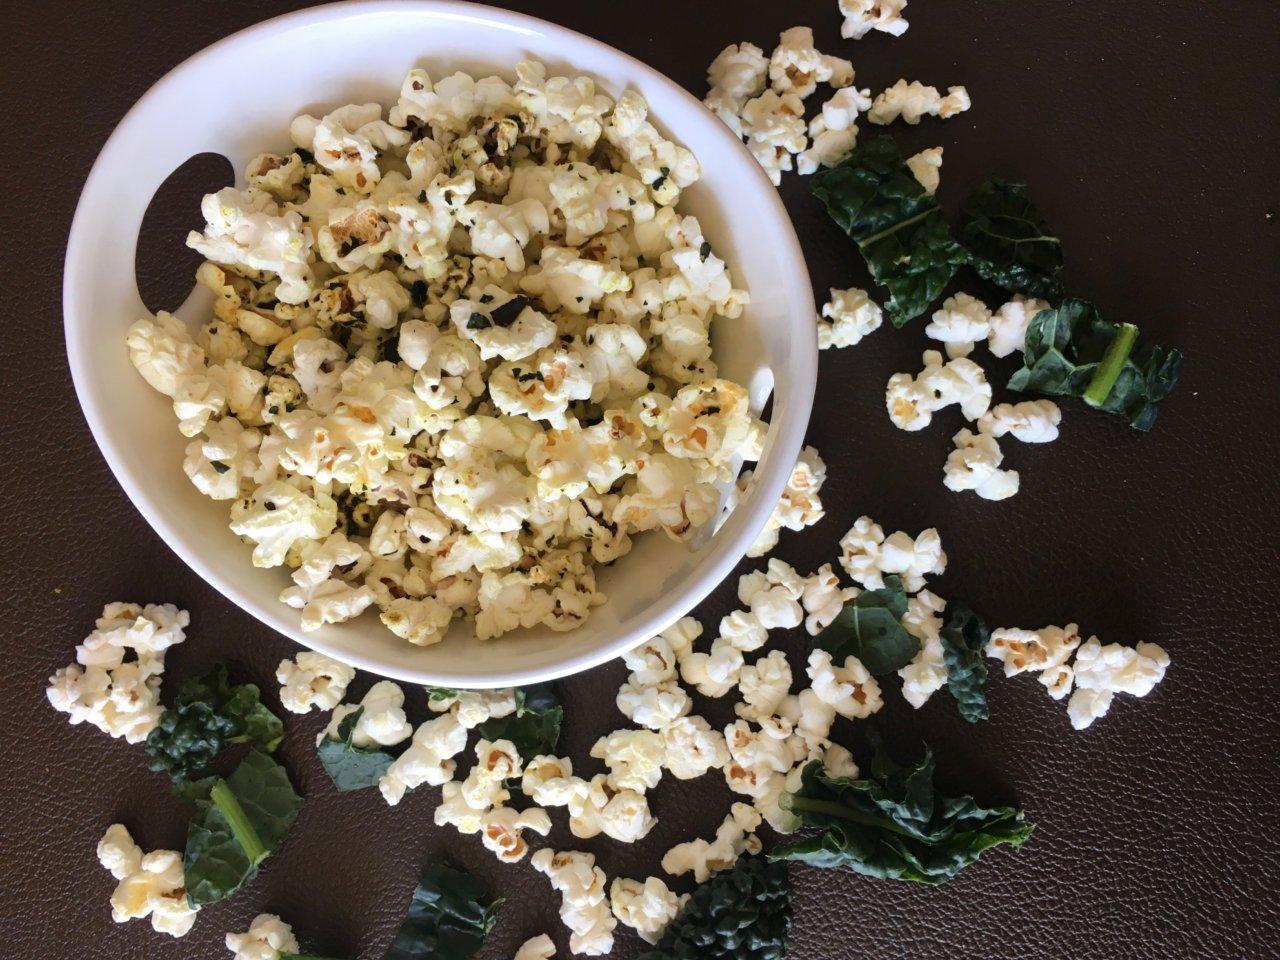 Kale-Cheezy-Popcorn-2-1280x960.jpg